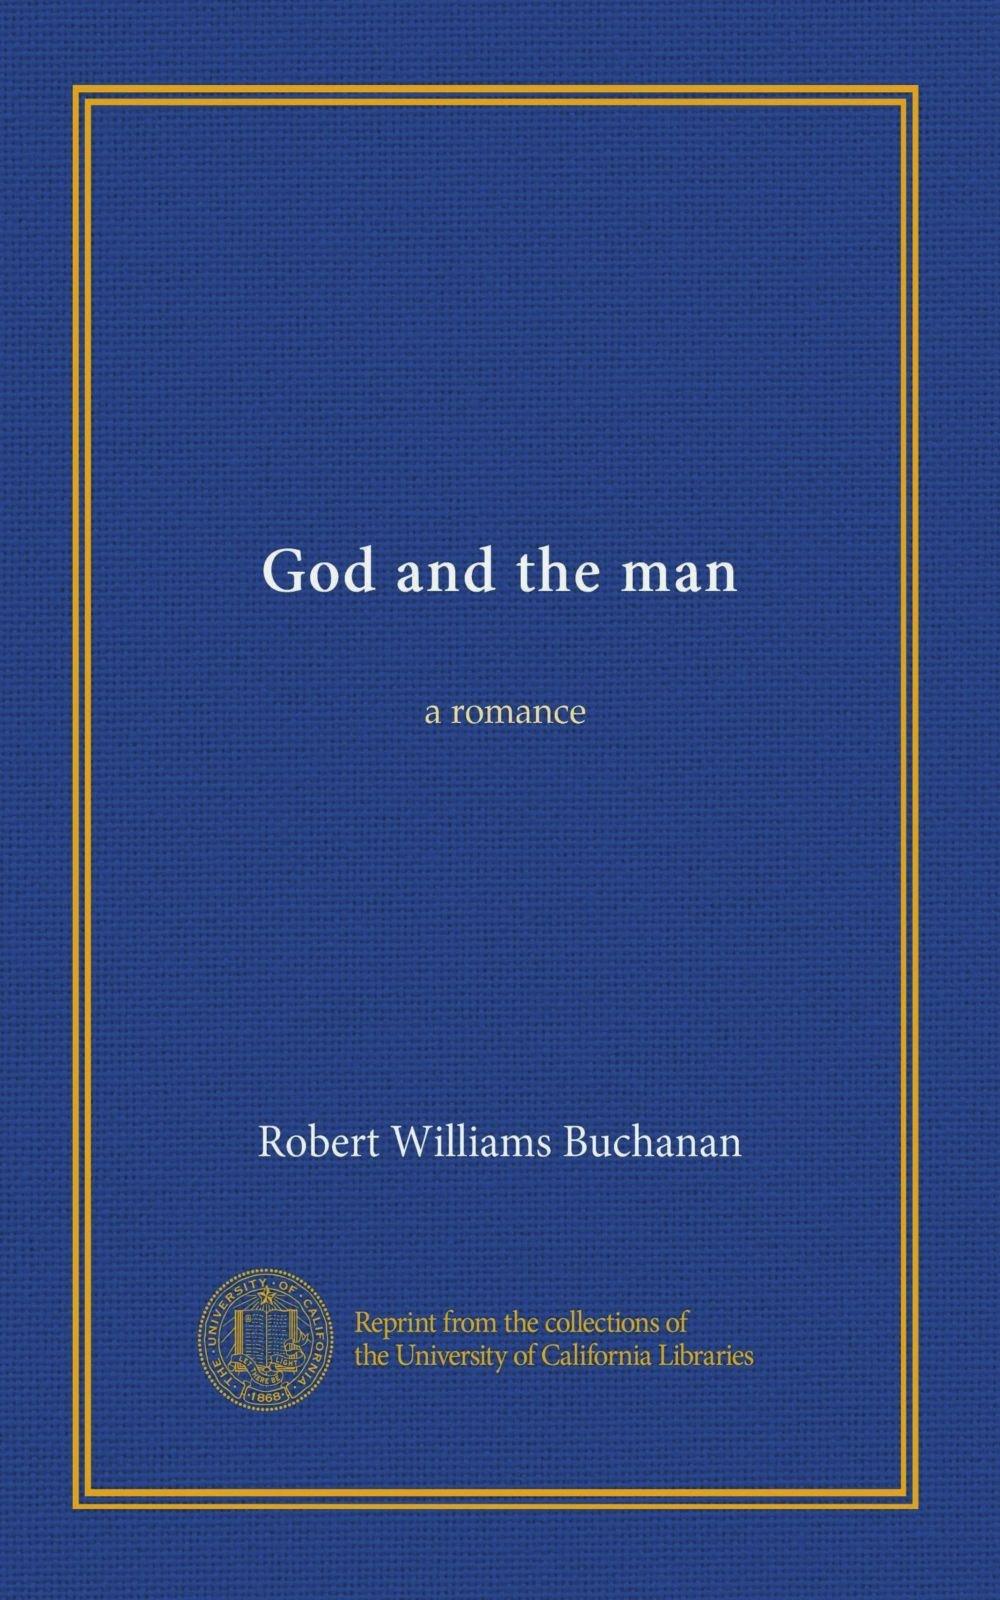 God and the man: a romance PDF